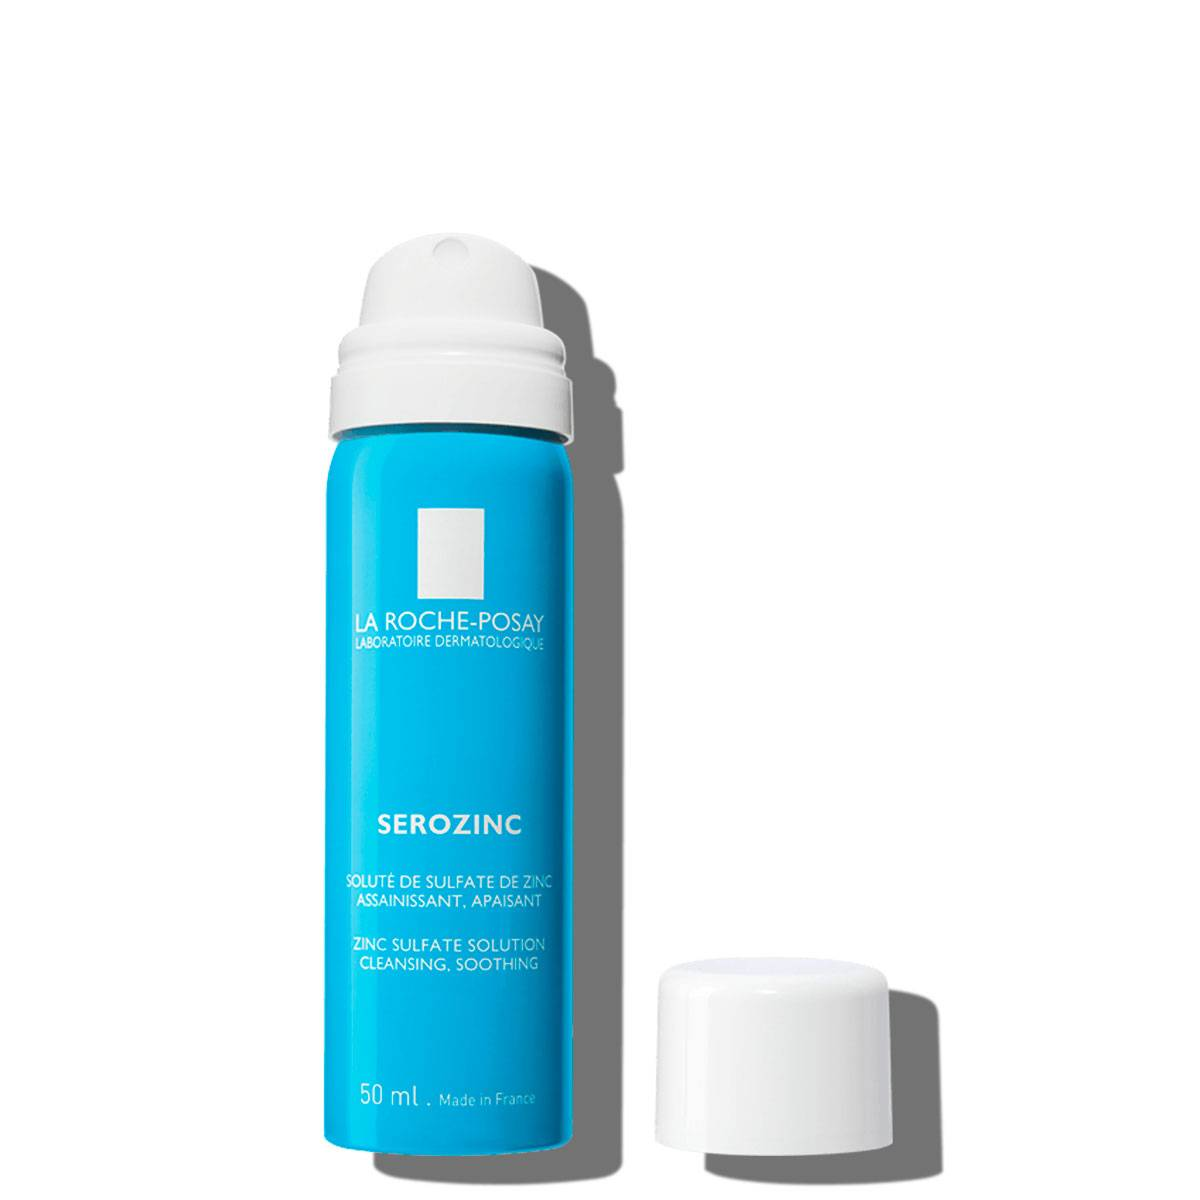 La Roche Posay Tuotesivu Serozinc Spray Zinc 50ml 3337875522601 Open